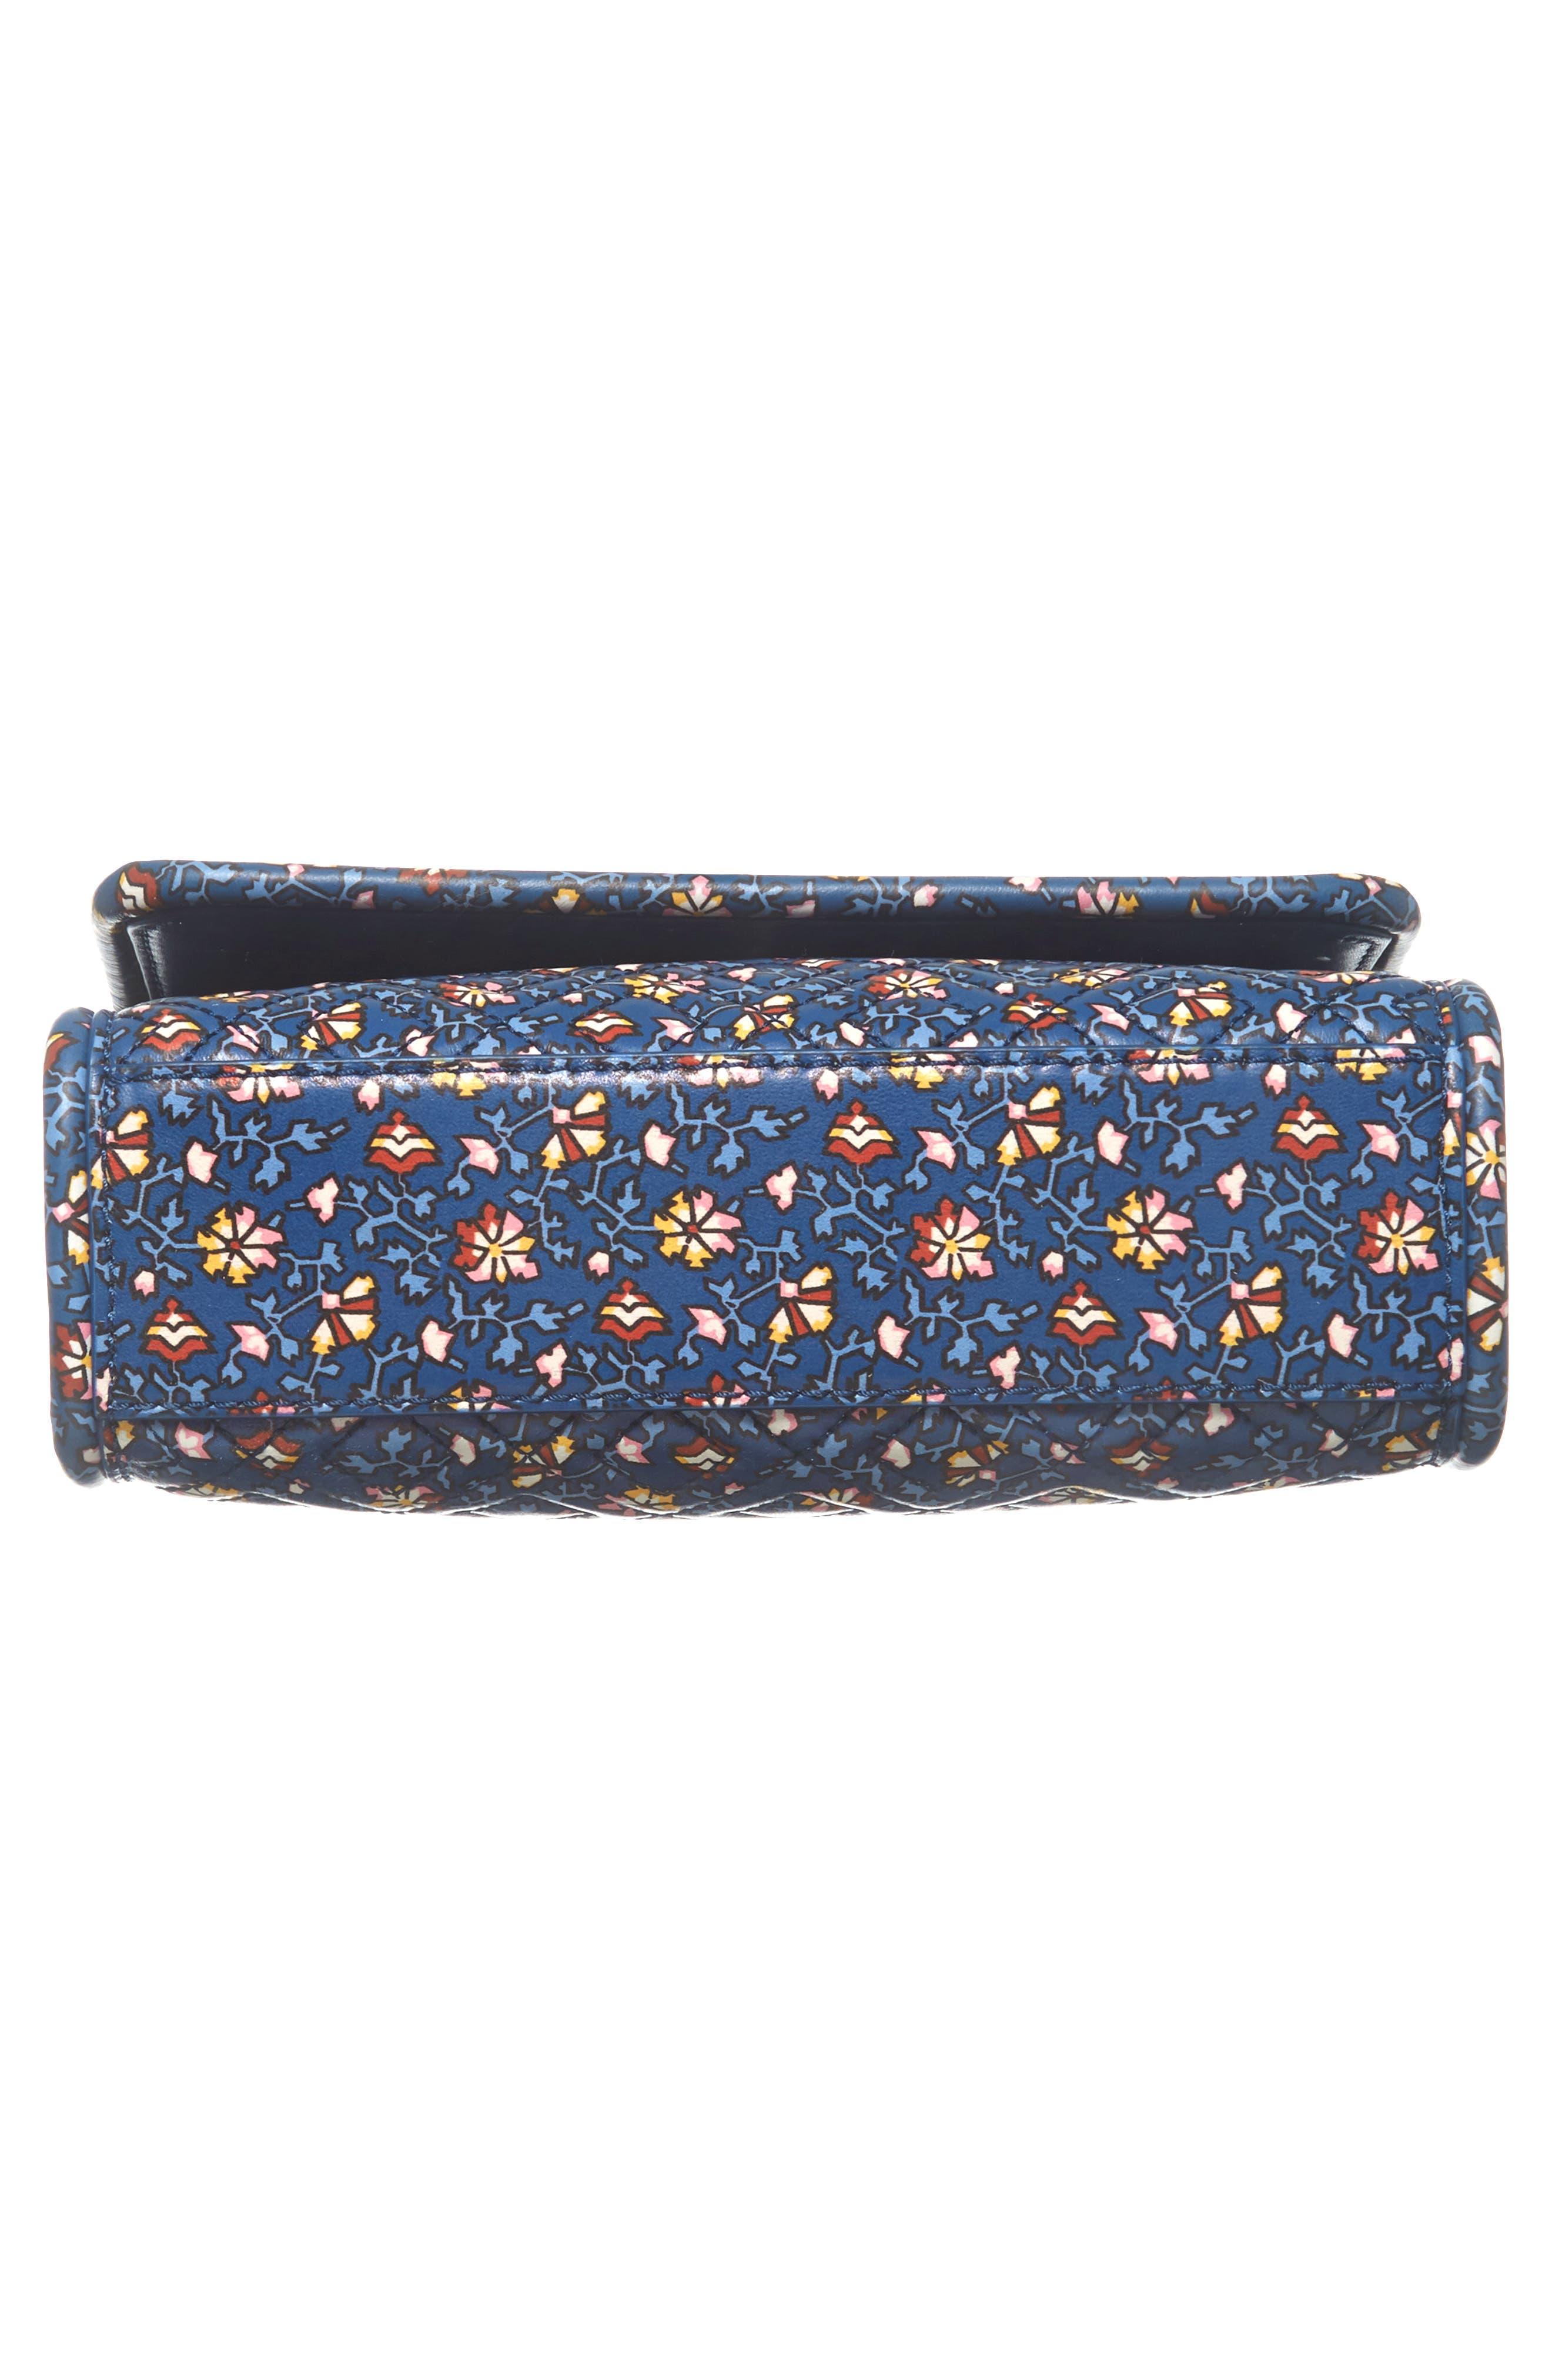 Fleming Print Leather Convertible Shoulder Bag,                             Alternate thumbnail 6, color,                             BLUE WILD PANSY